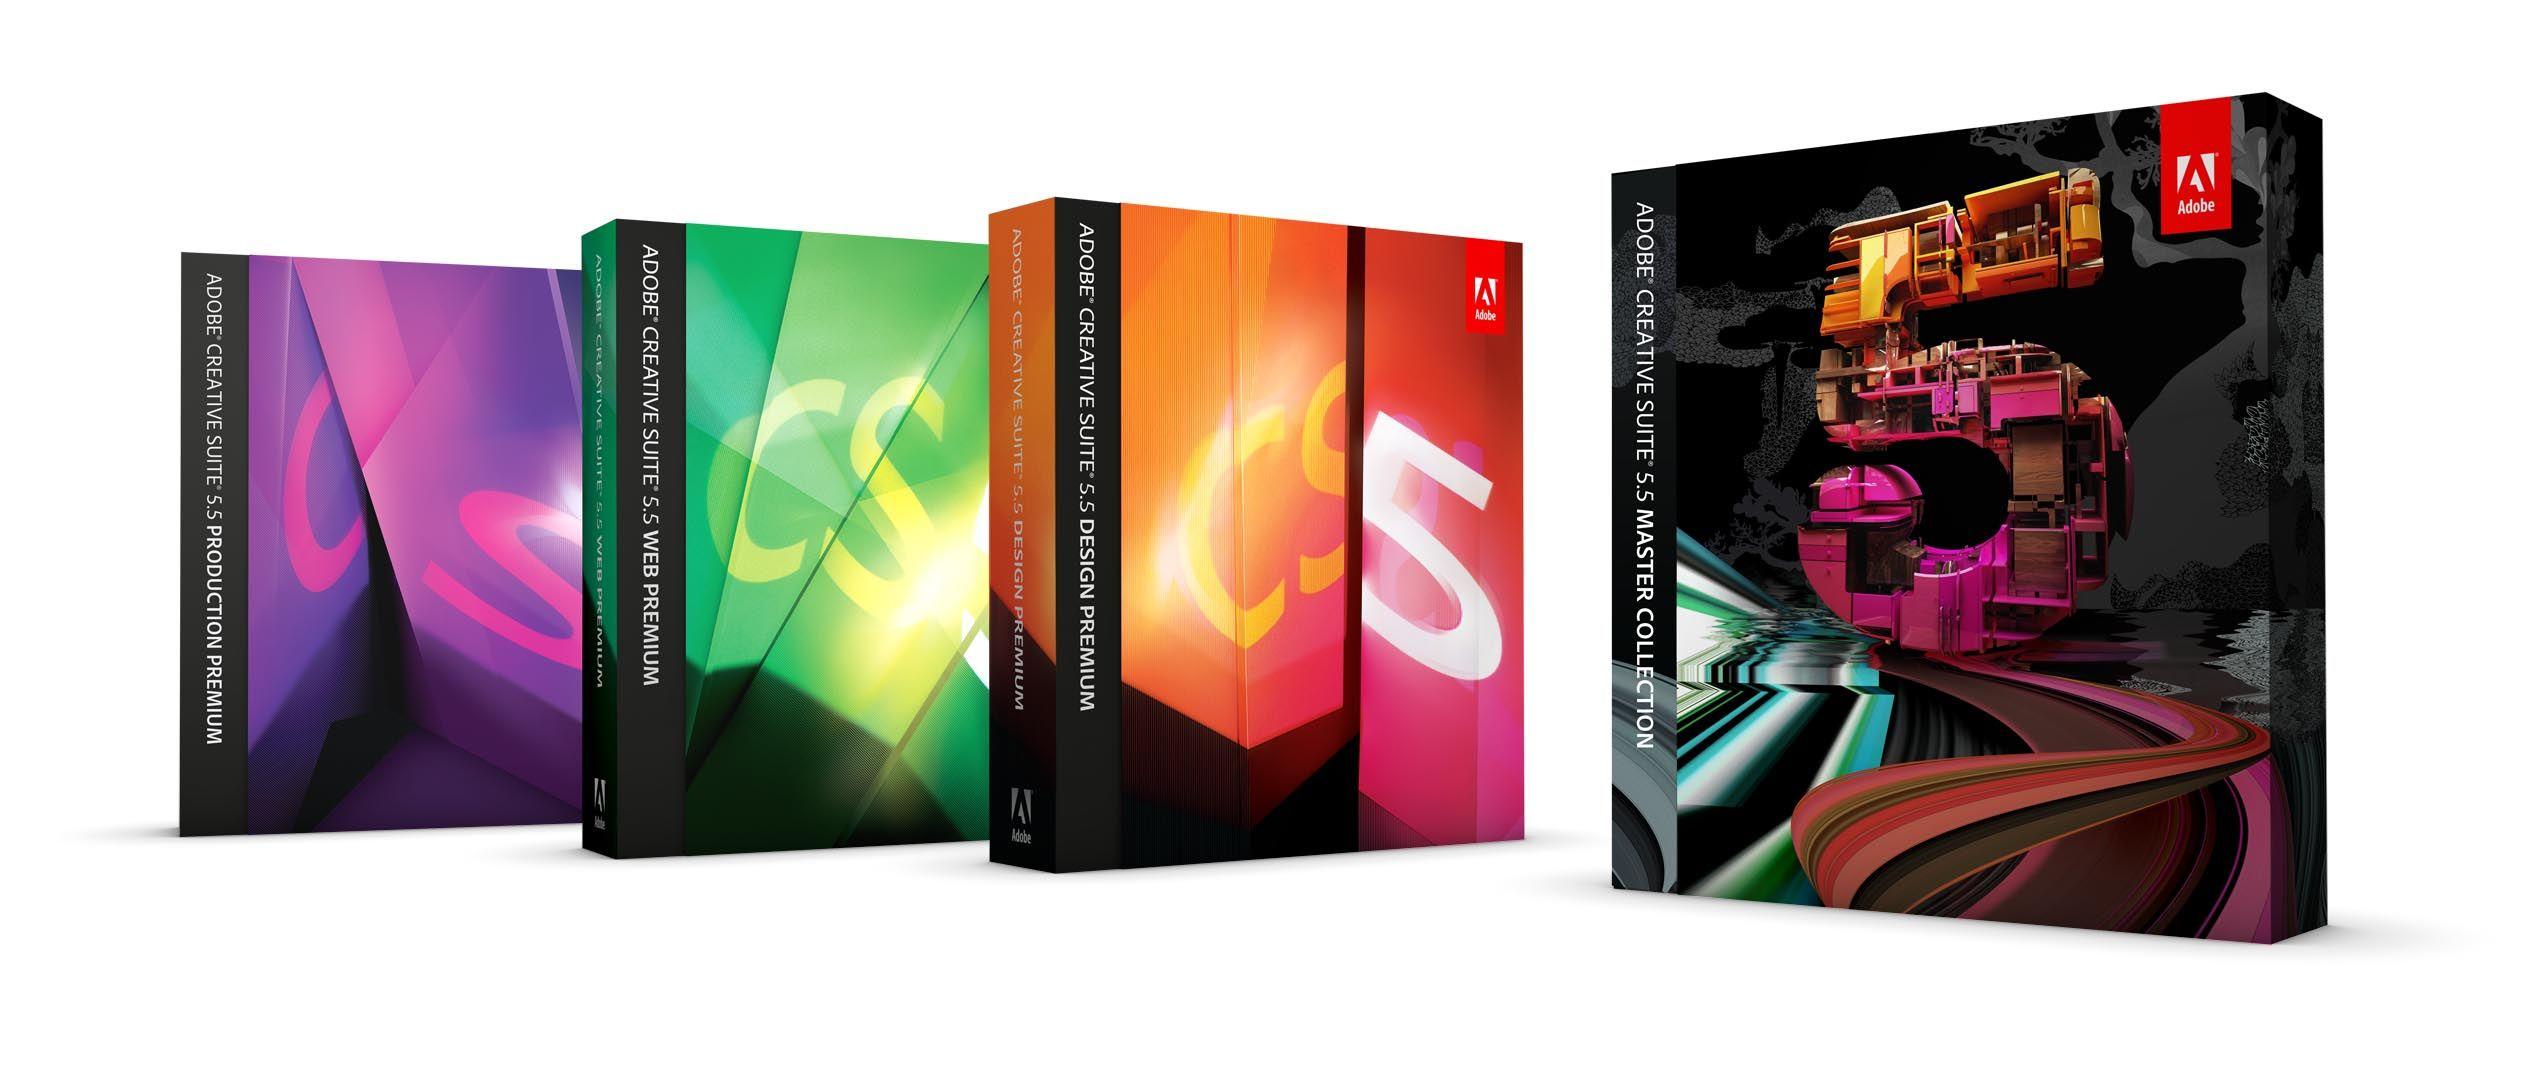 Adobe slipper Creative Suite 5.5